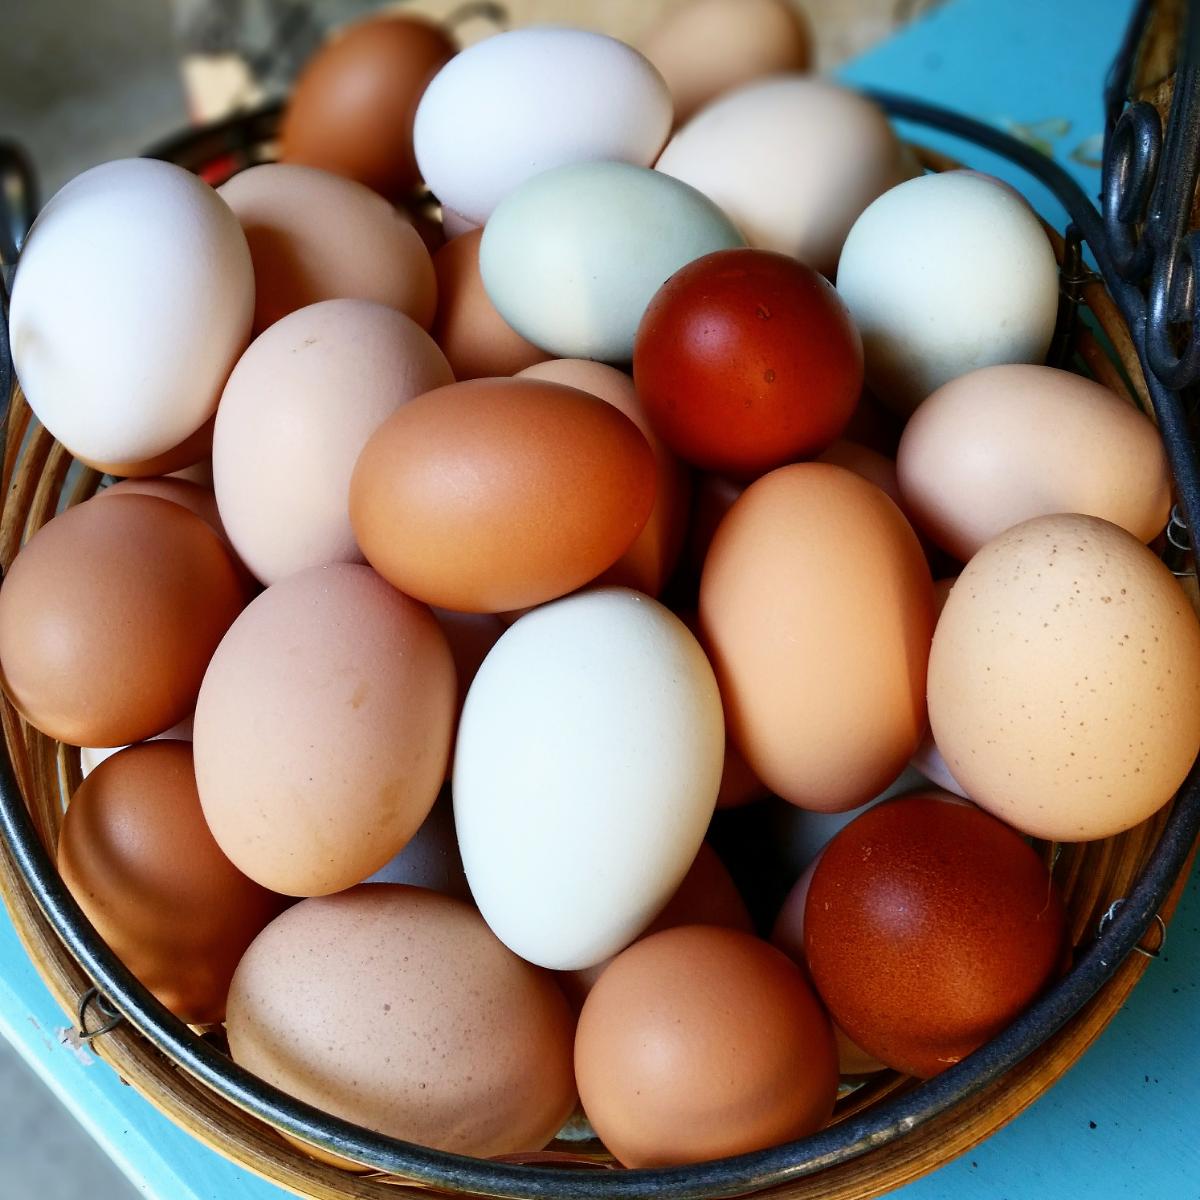 freerange-nongmo-chicken-eggs-1-dozen